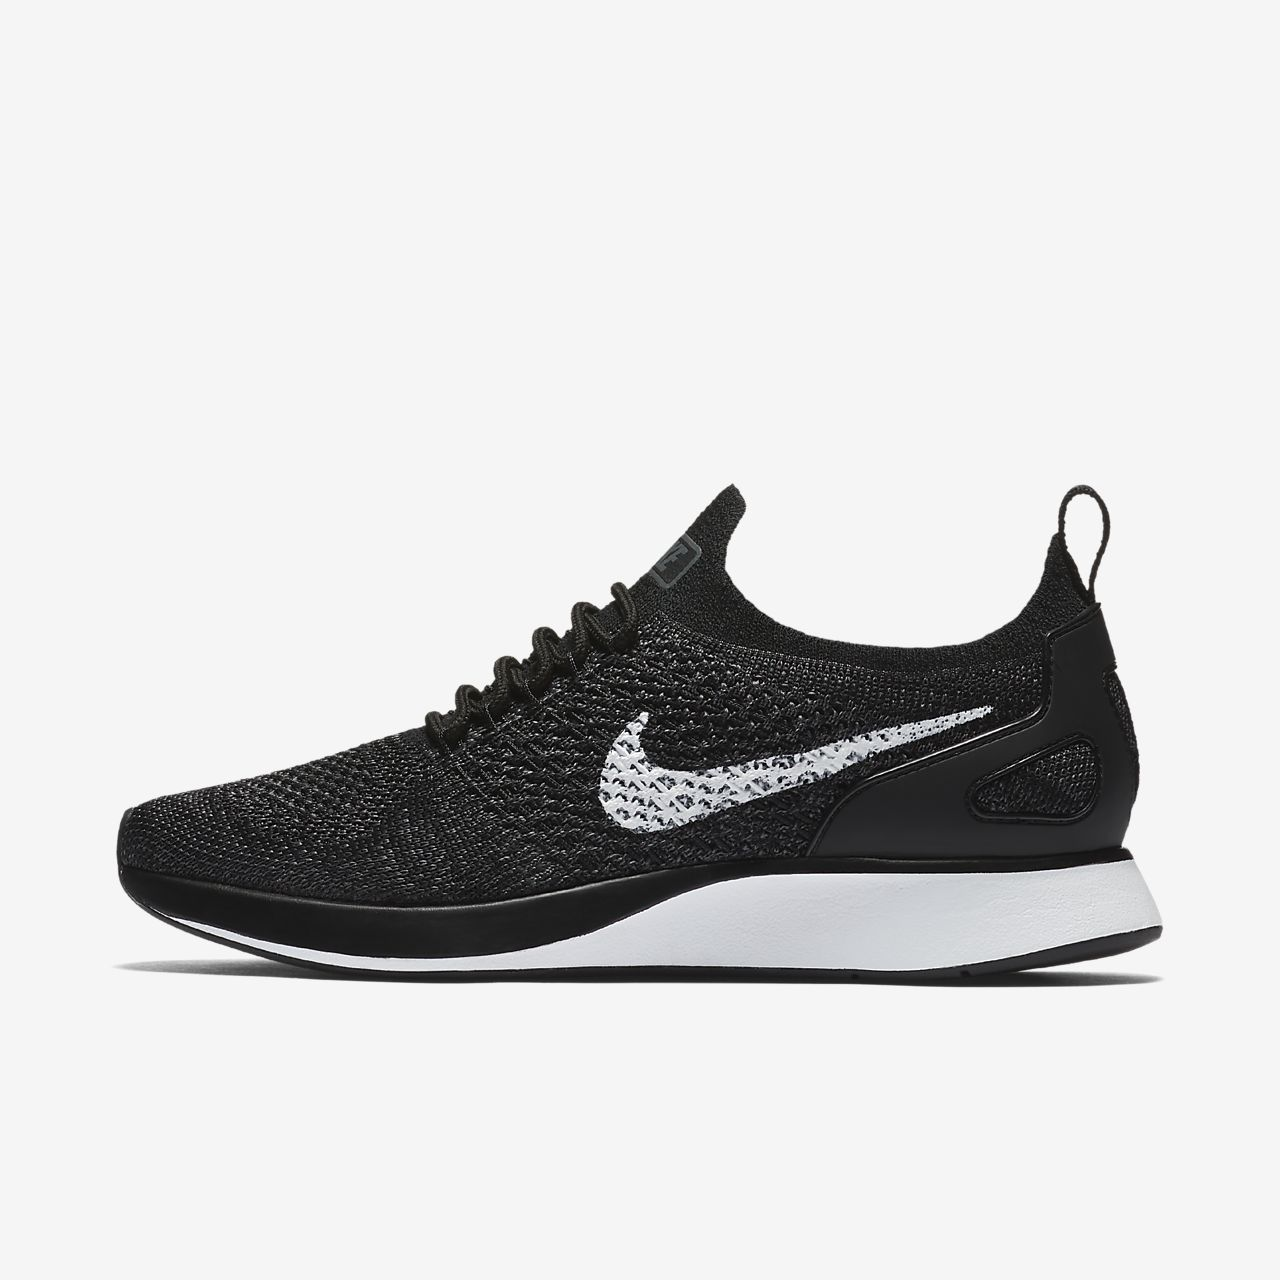 ... Nike Air Zoom Mariah Flyknit Racer Women's Shoe